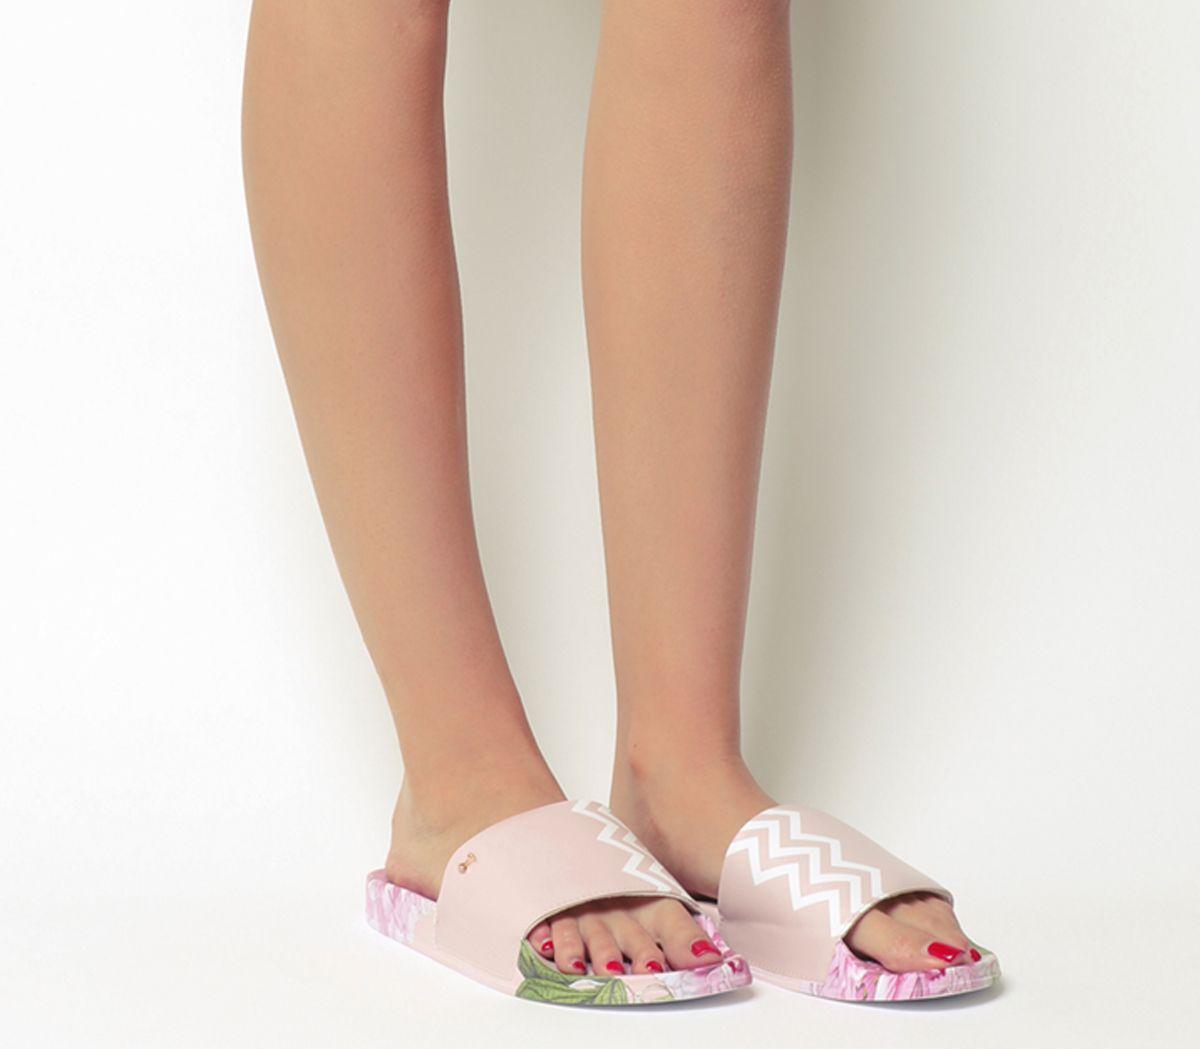 0ee5e4cd8 Ted Baker Aveline Slides Palace Gardens - Sandals